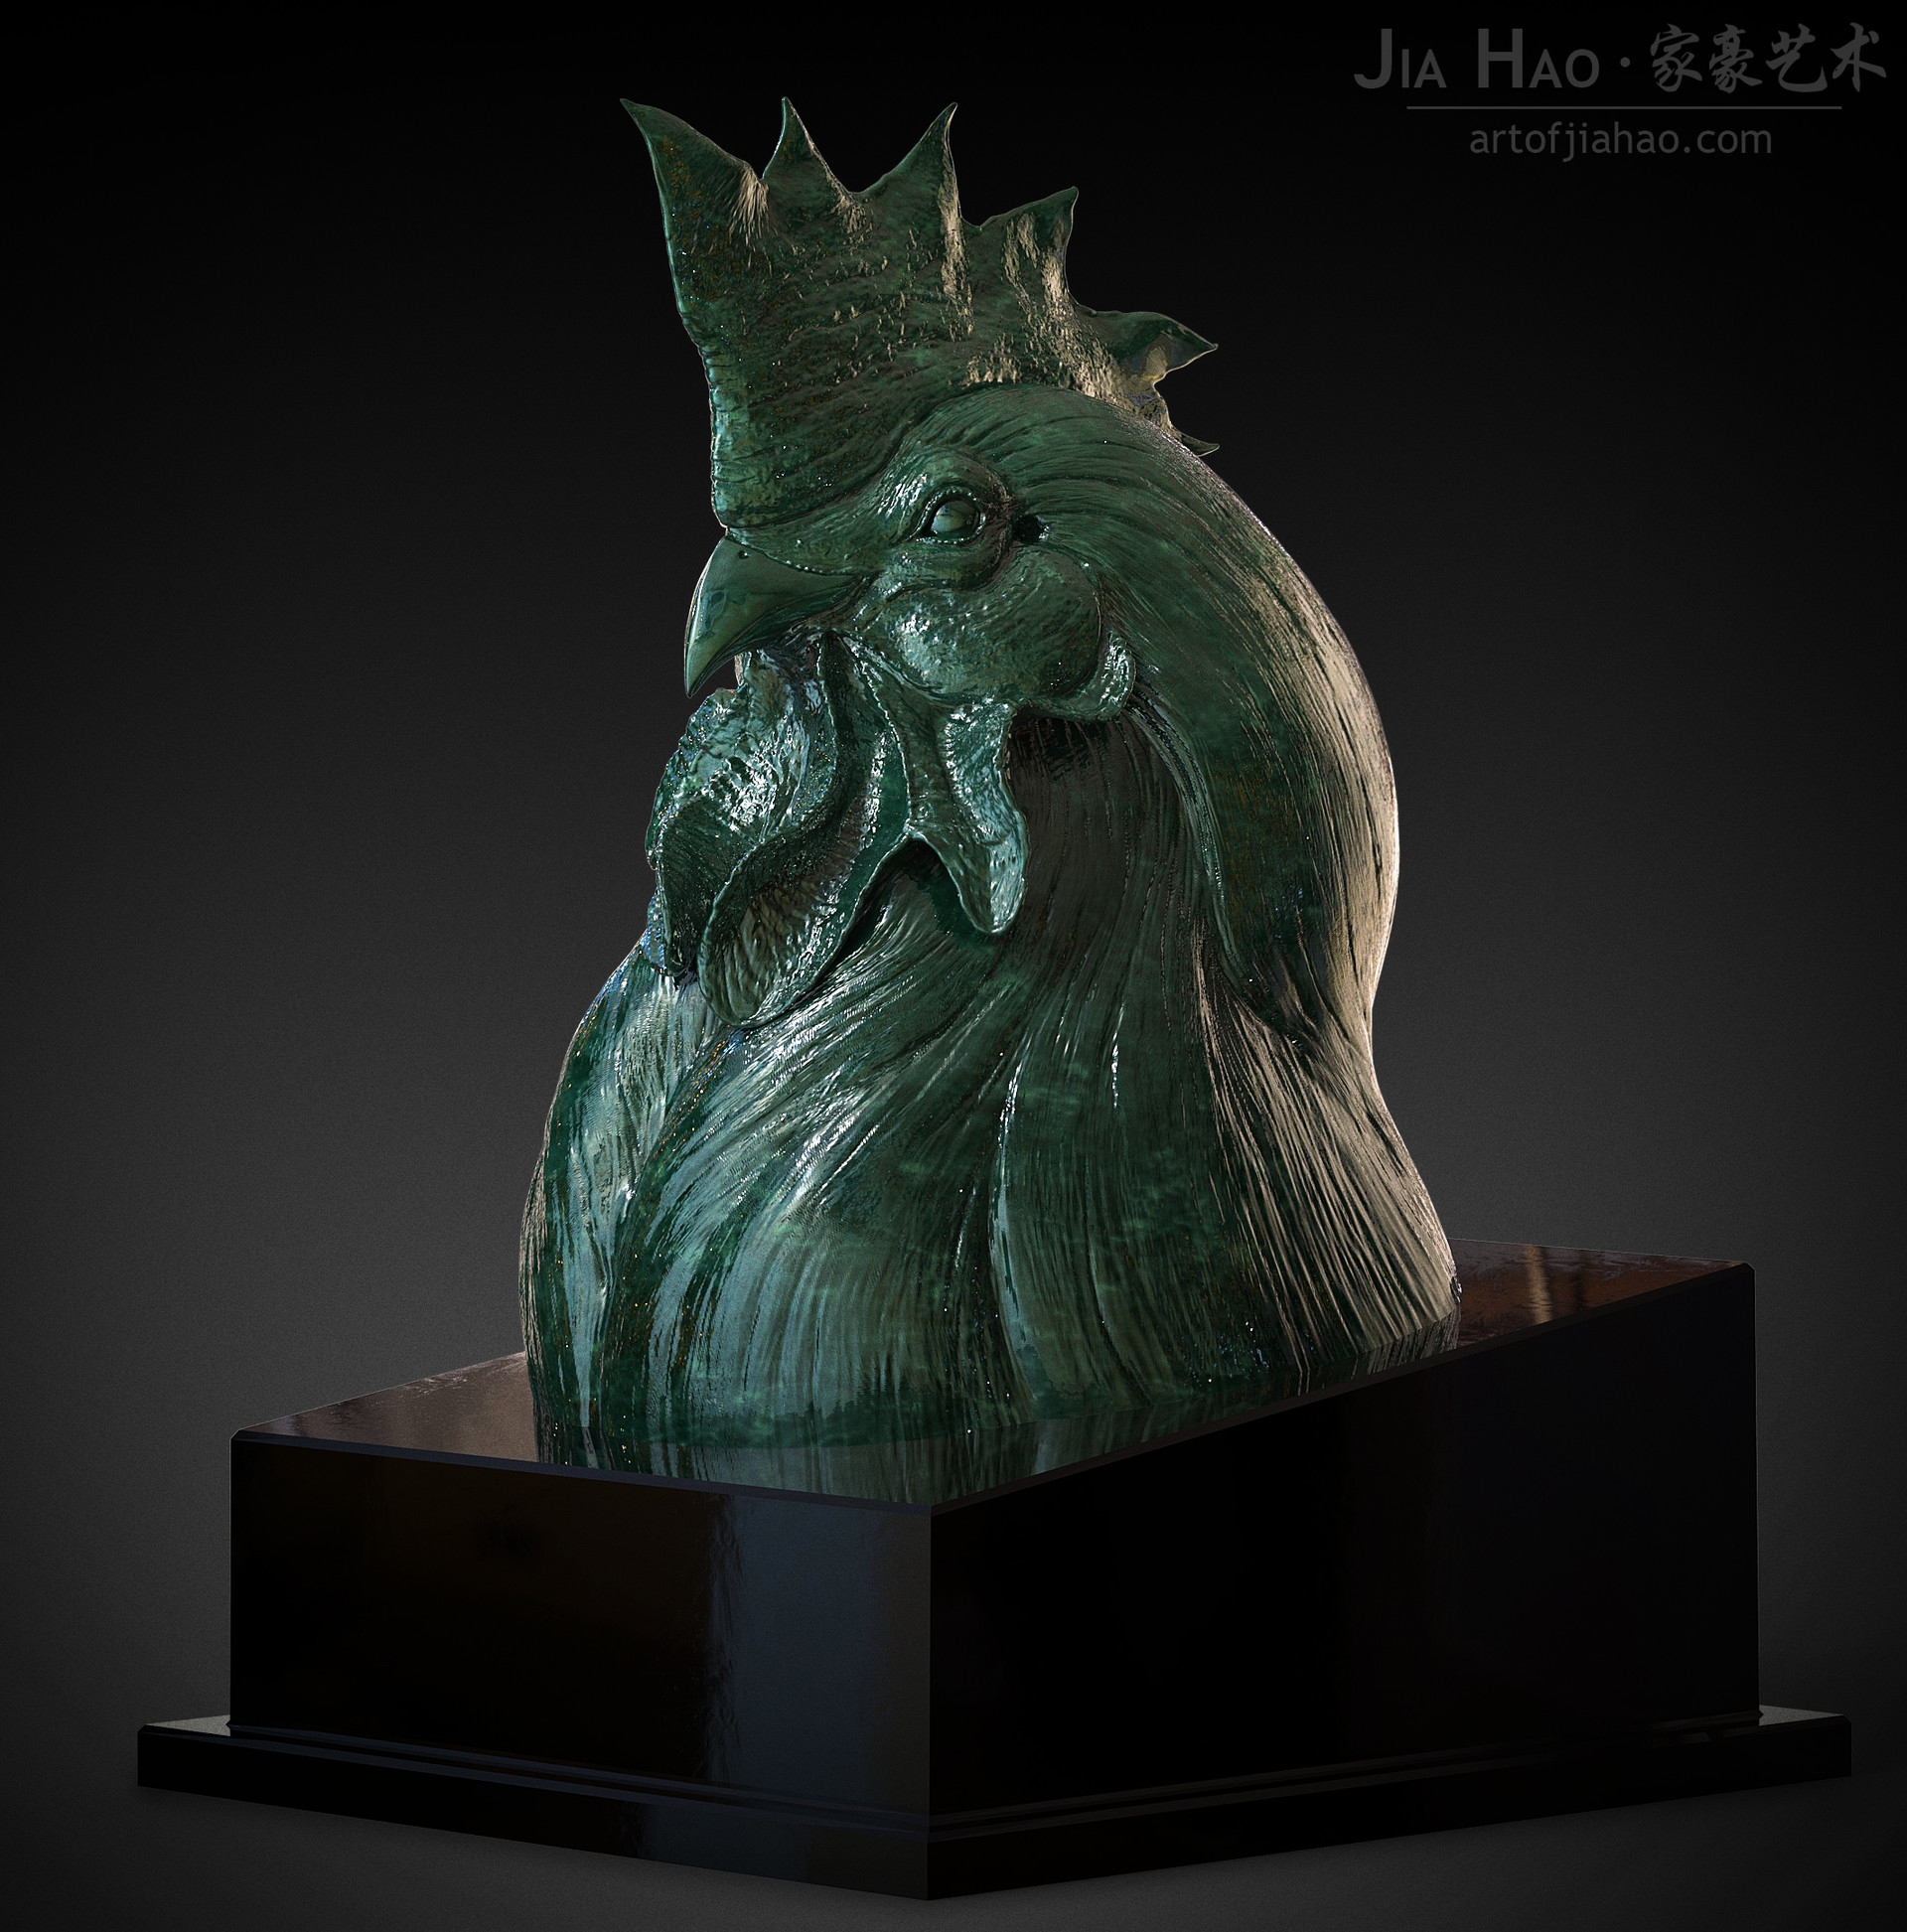 Jia hao 2017 sculpture majesticrooster comp jade